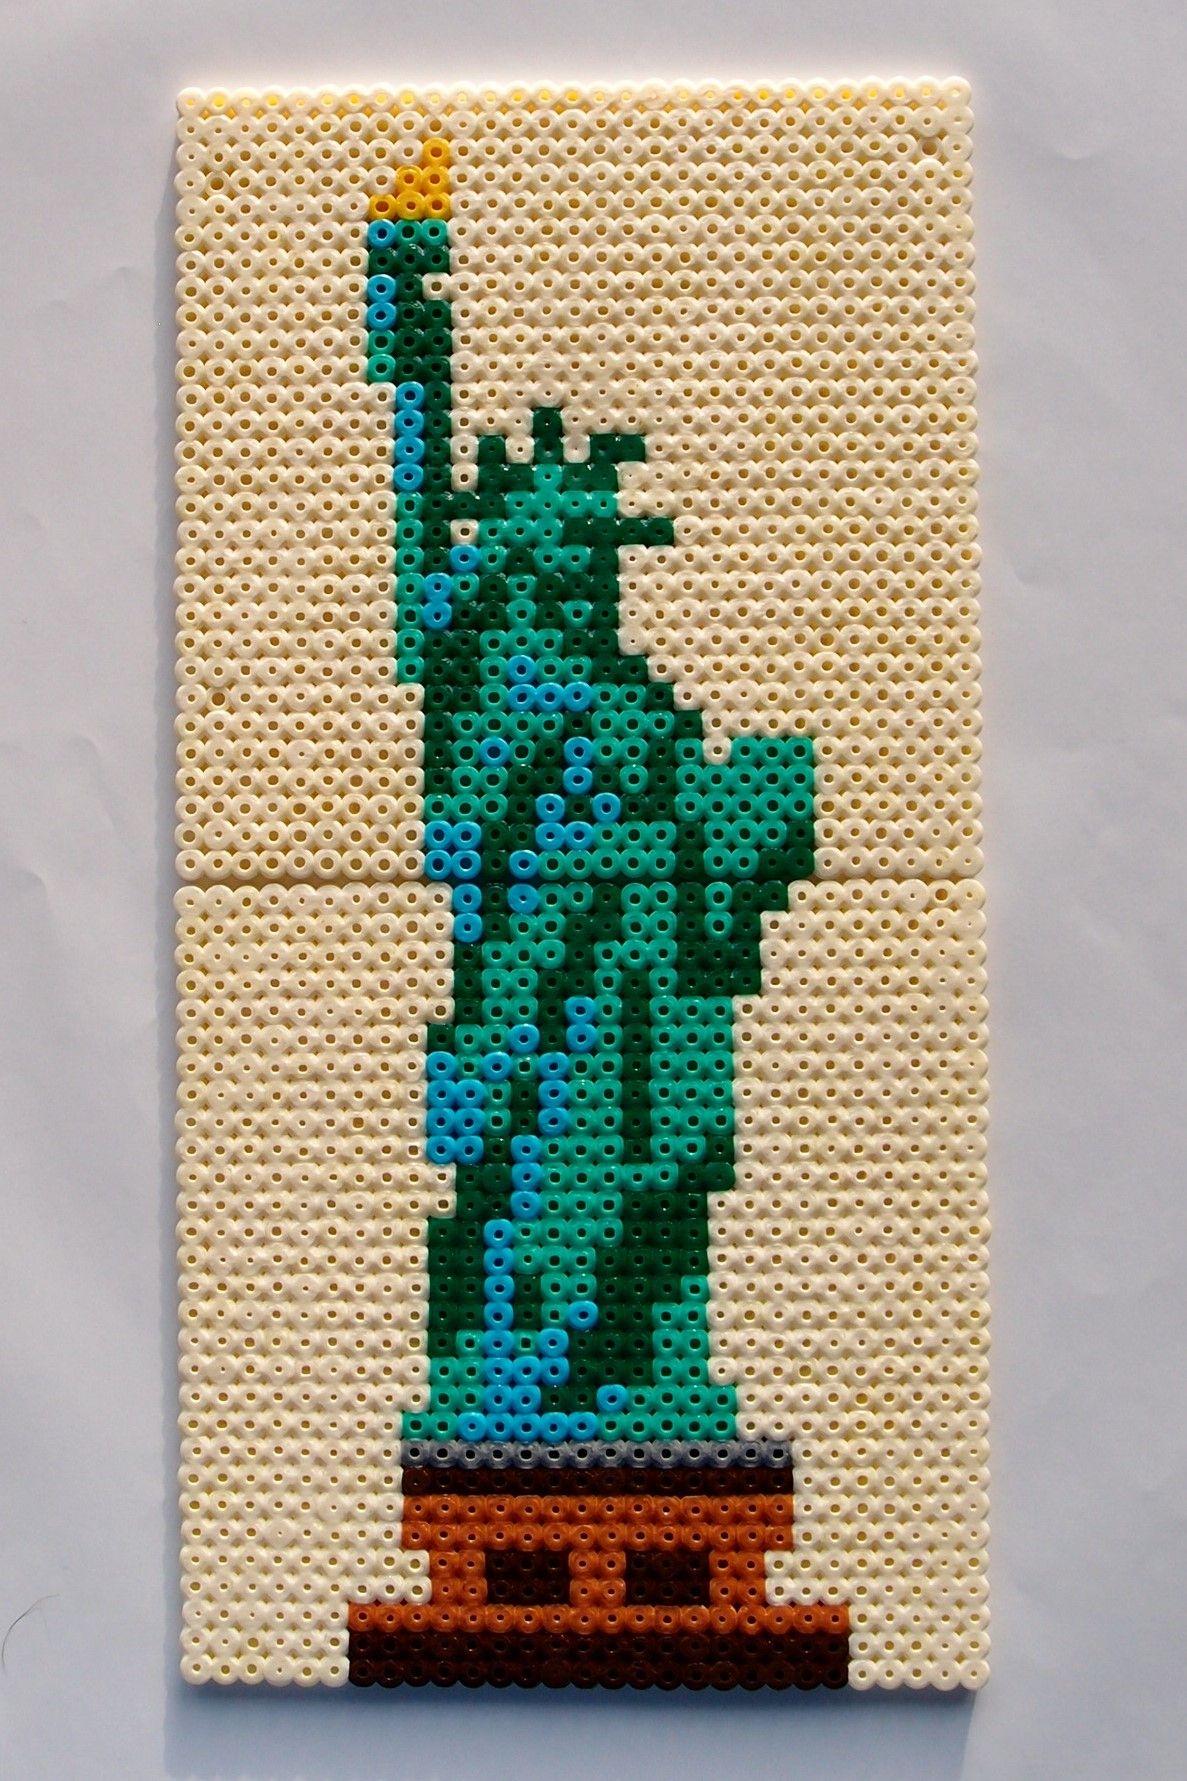 Hama Perler Beads Frihedsgudinden Statue Of Liberty By Nina V